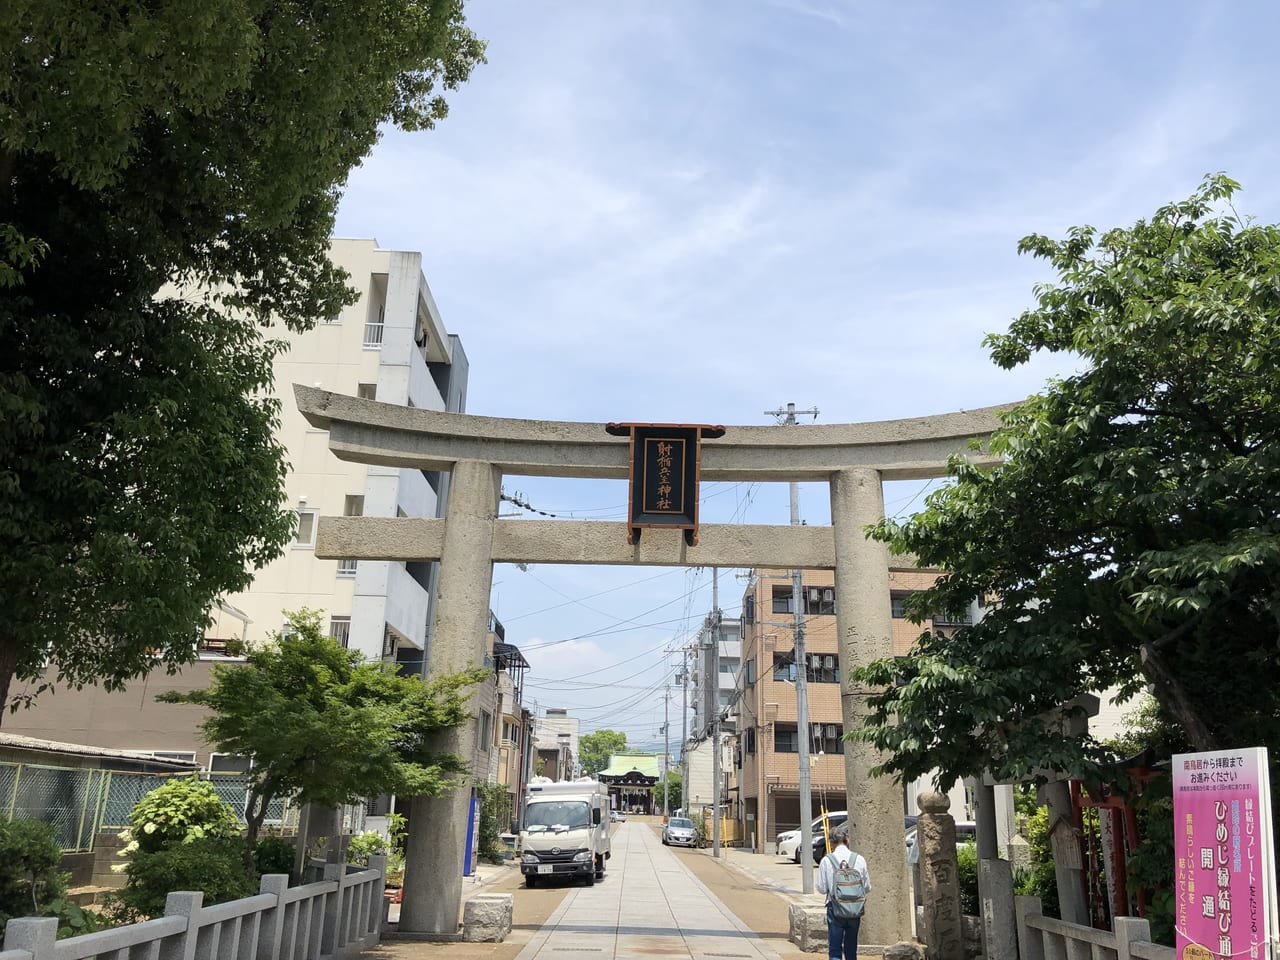 2019年播磨国総社 射楯兵主神社行き方